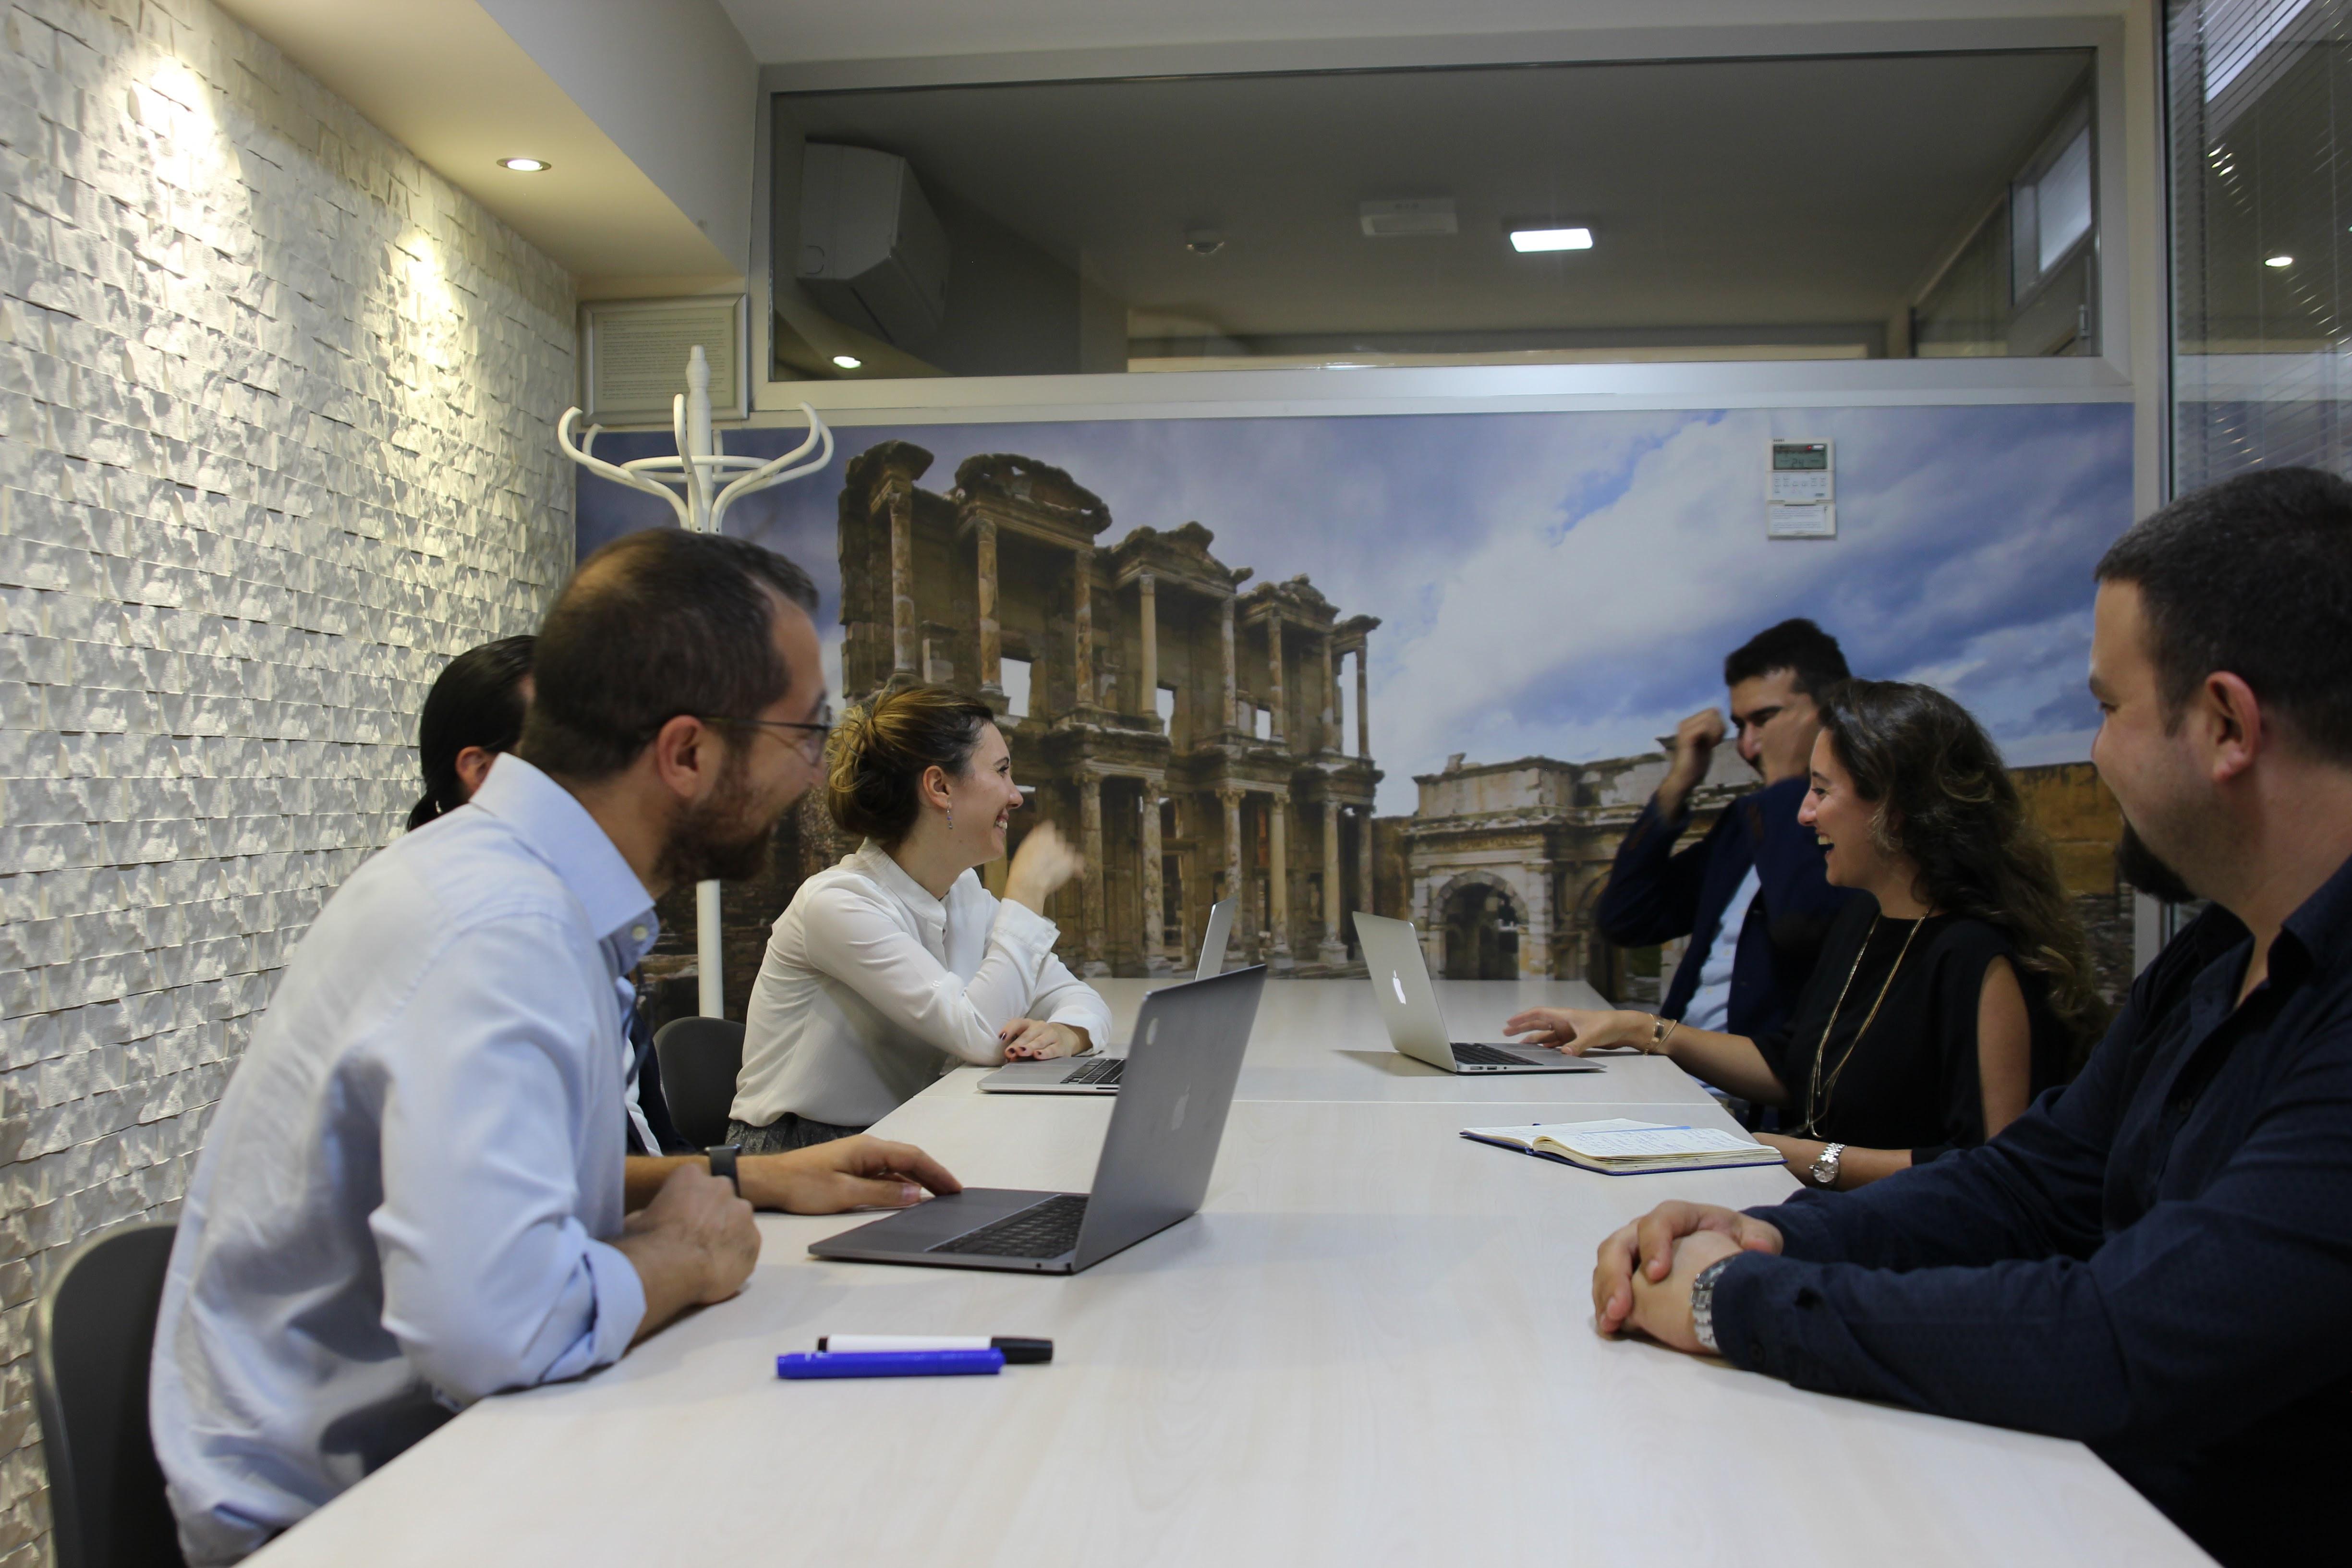 Şişli Micro Meeting Room